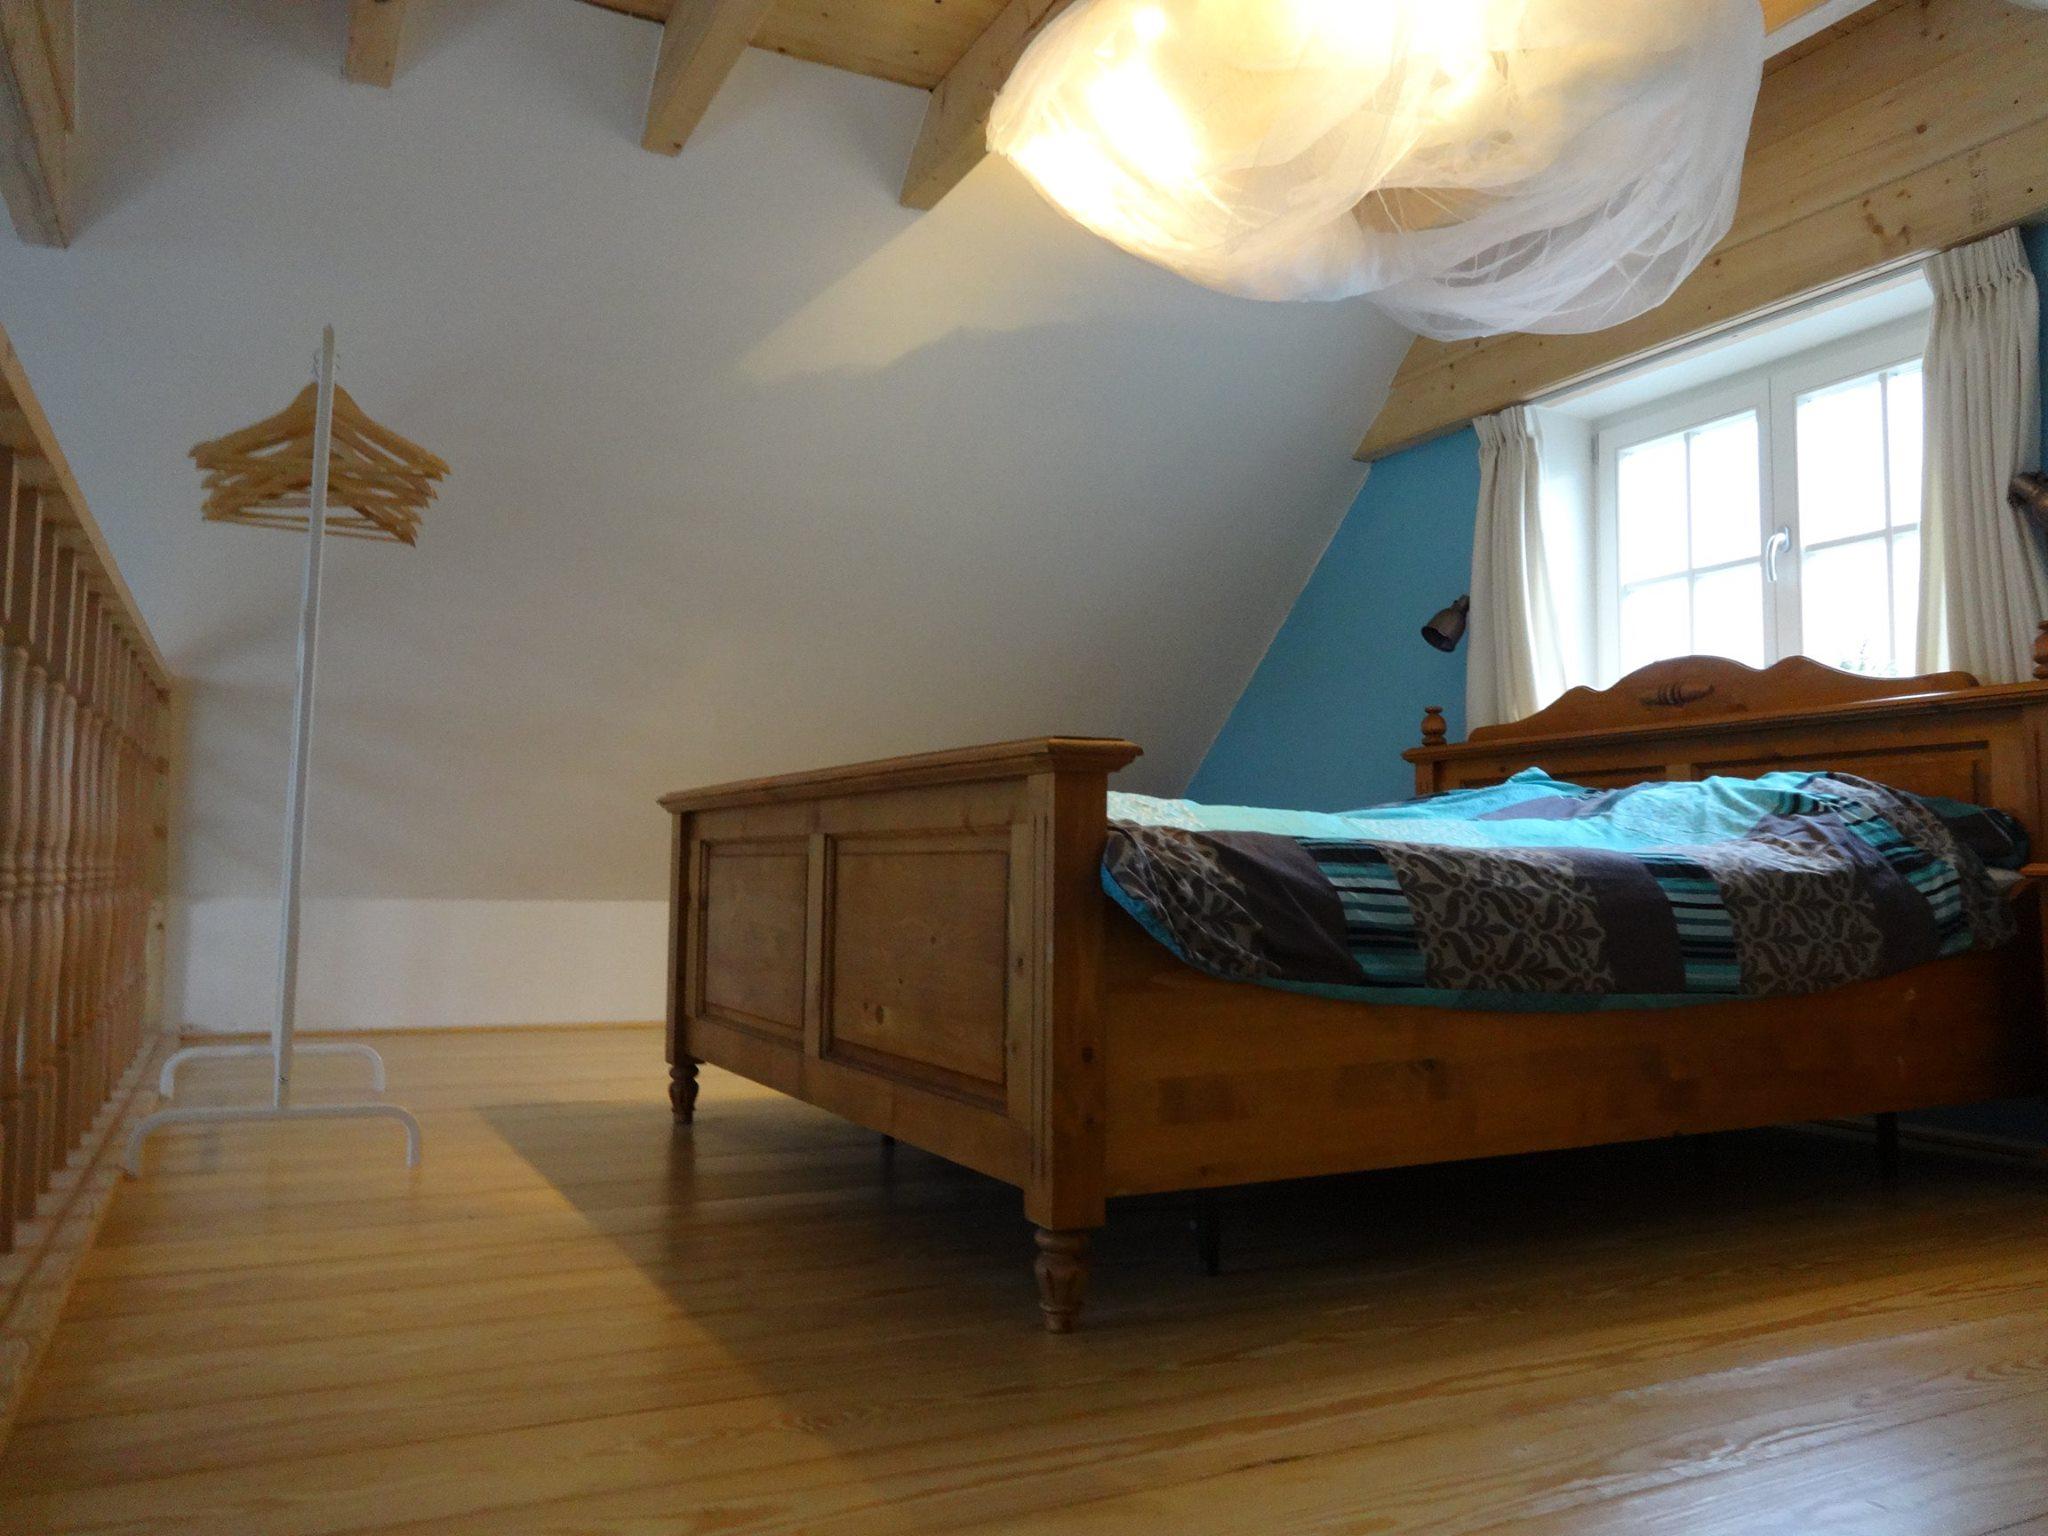 impressie-slaapkamer-bed-and-breakfast-westerbork-drenthe